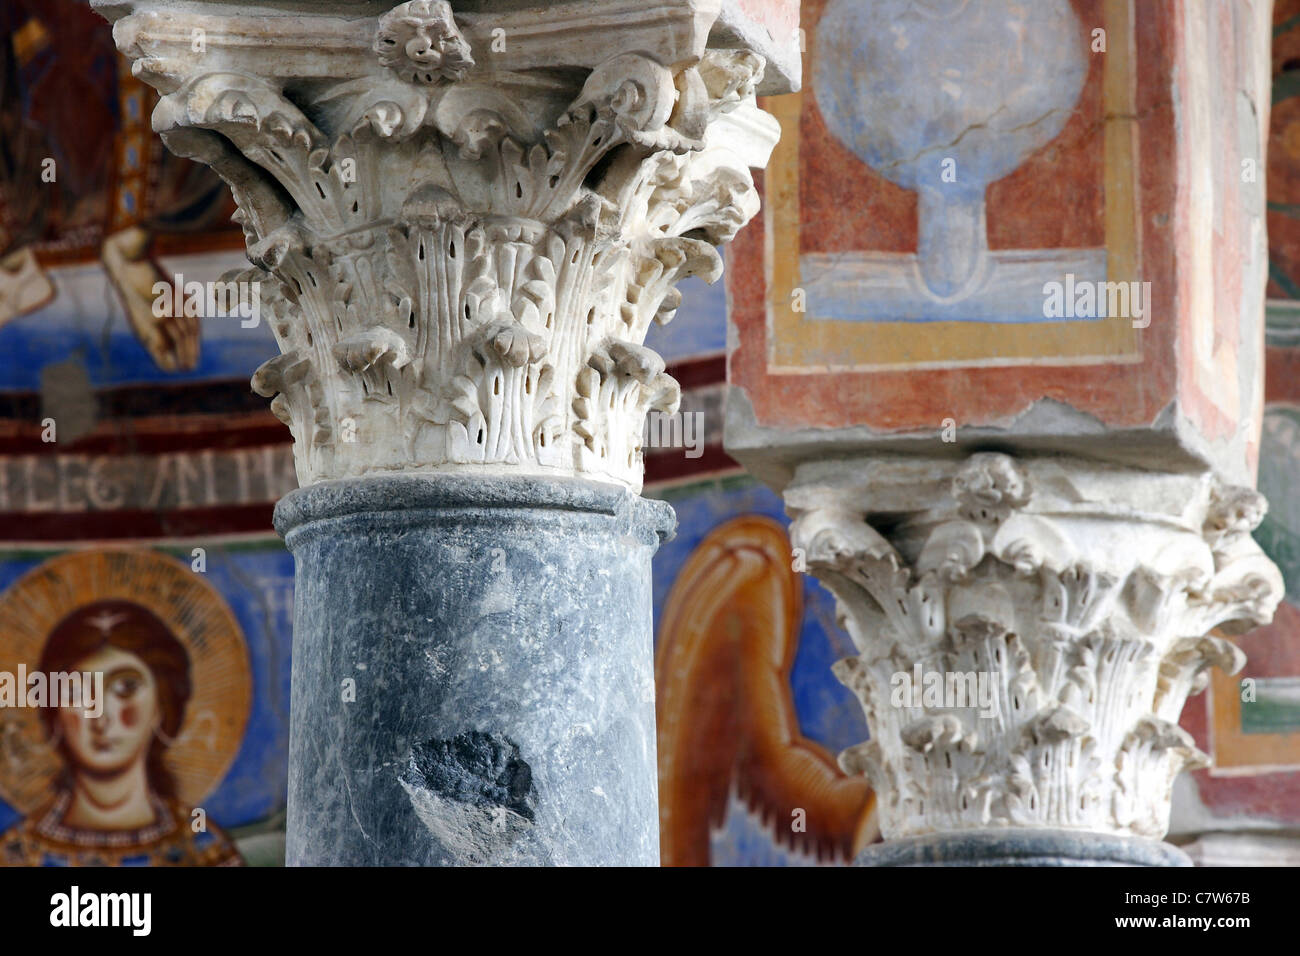 Italy, Campania, Capua, interiors of Sant'Angelo in Formis church Stock Photo